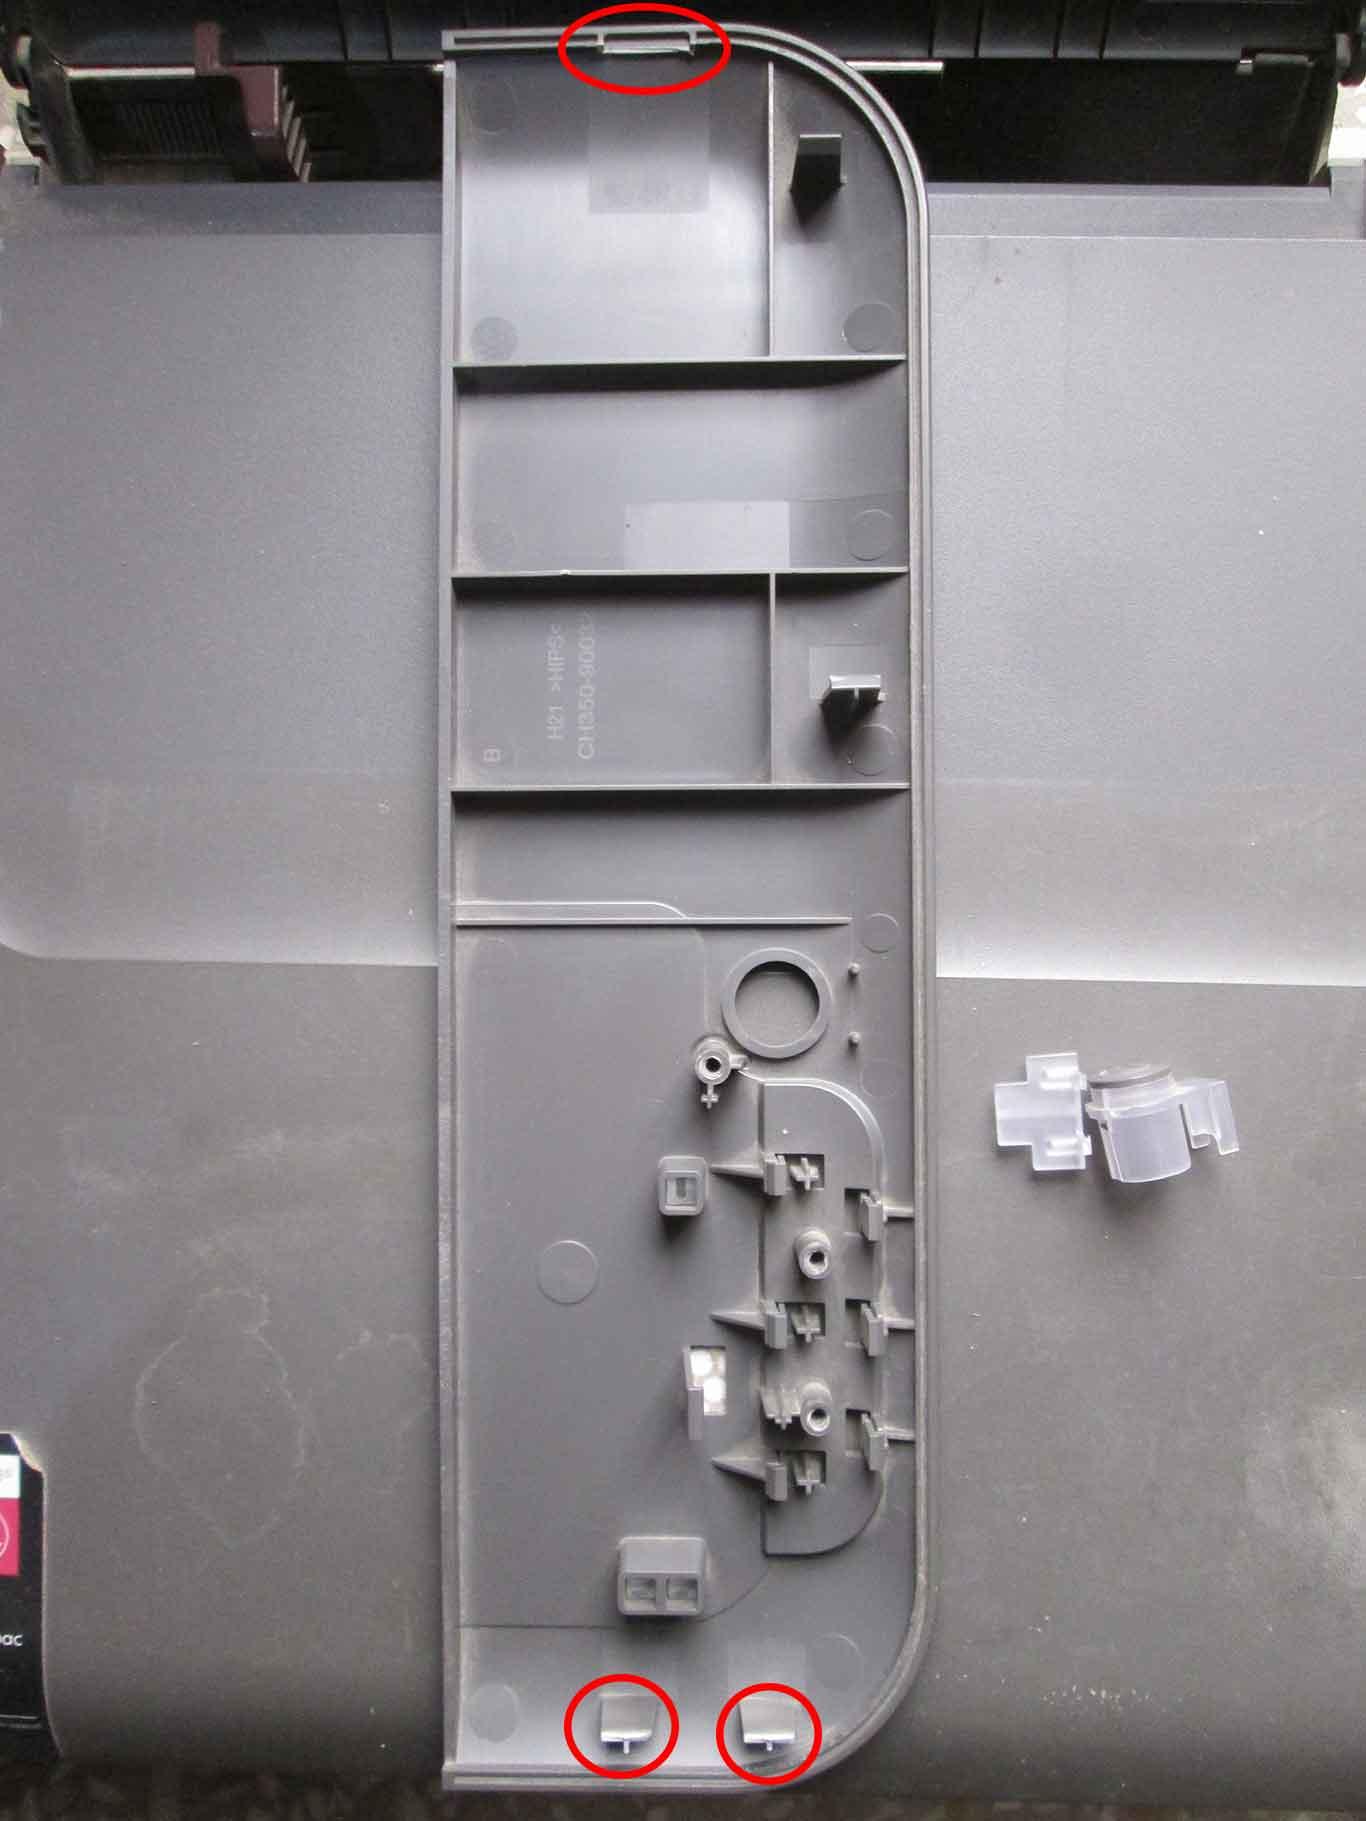 HP DeskJet 1050 Top Left Panel Removed